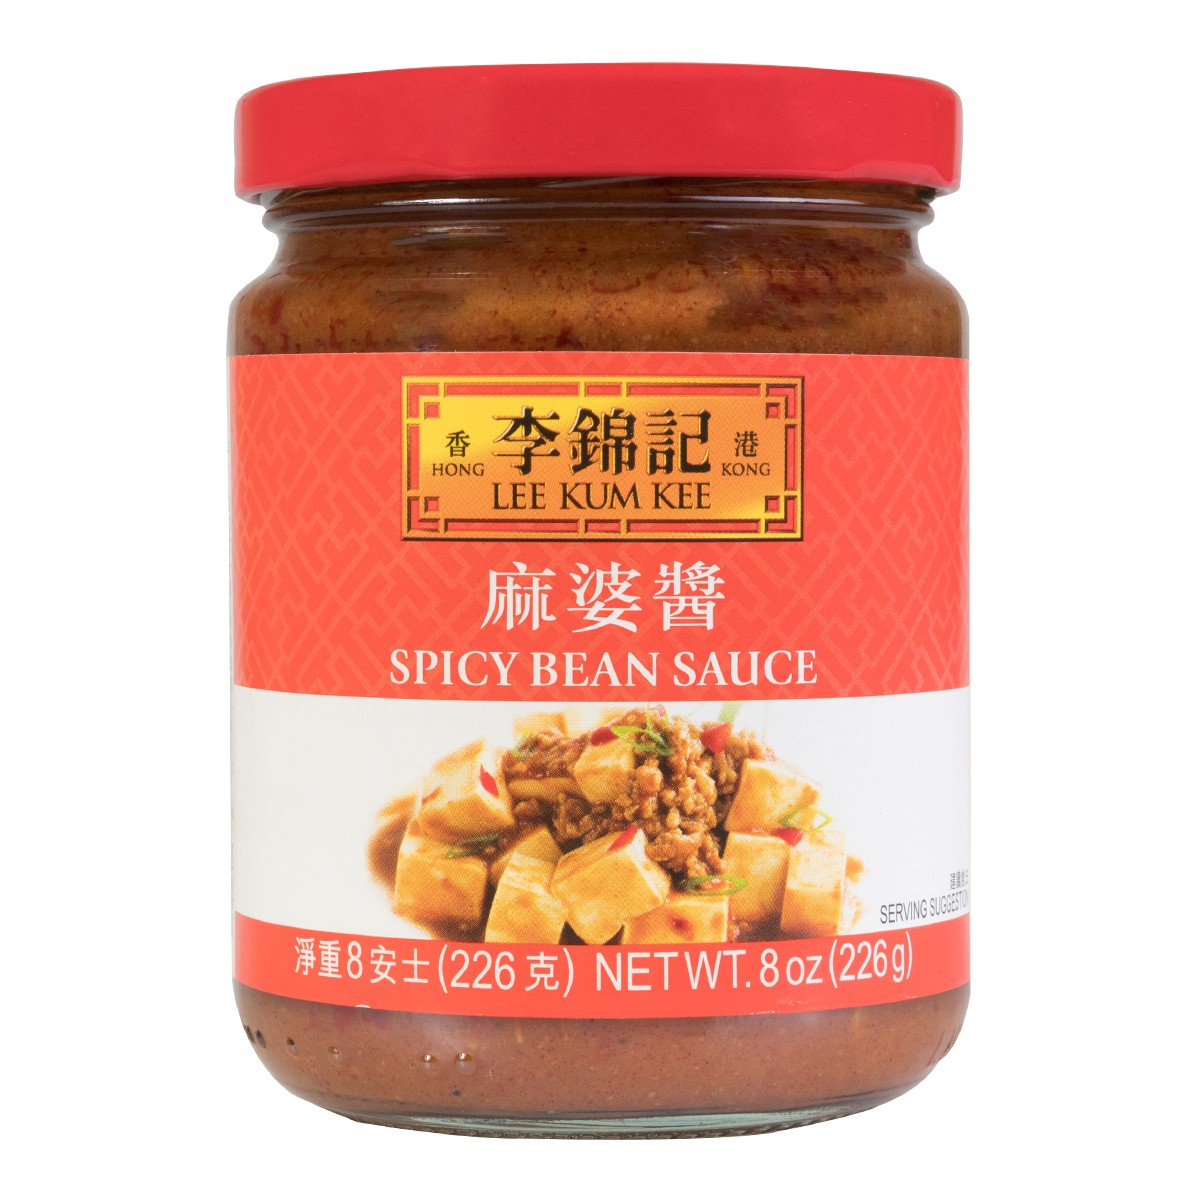 LEE KUM KEE Spicy Bean Sauce (Ma Po Sauce) 226g